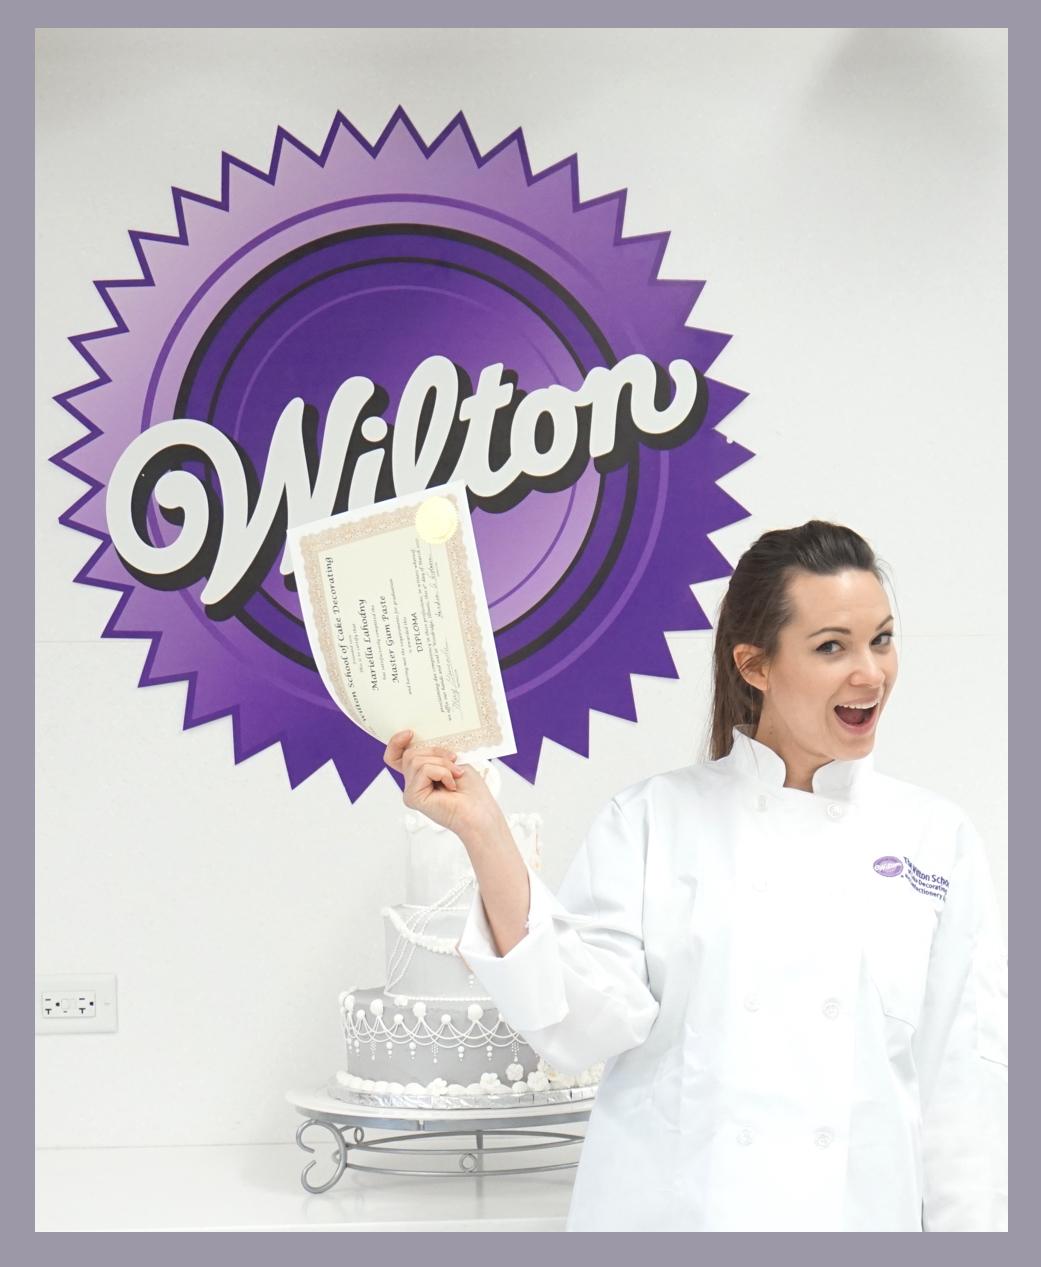 Mariella erhält Zertifikat der Cake Decorating Masterclass